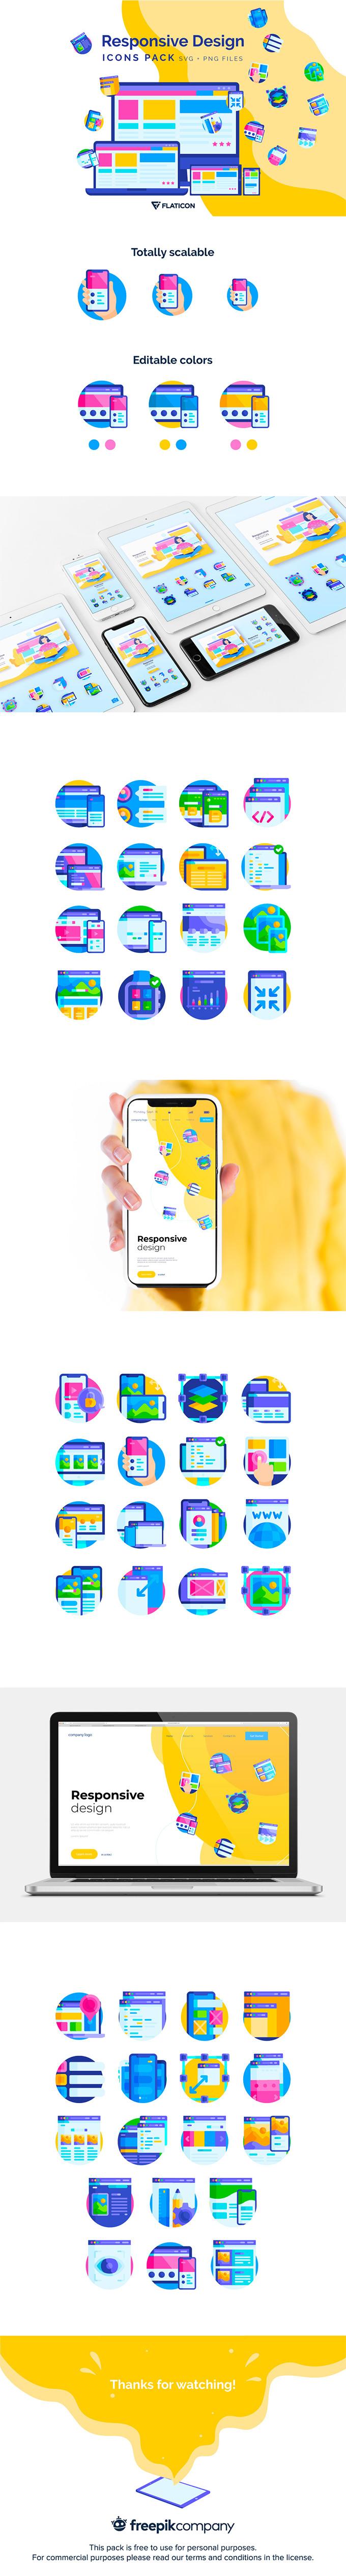 Responsive Design Icon Pack